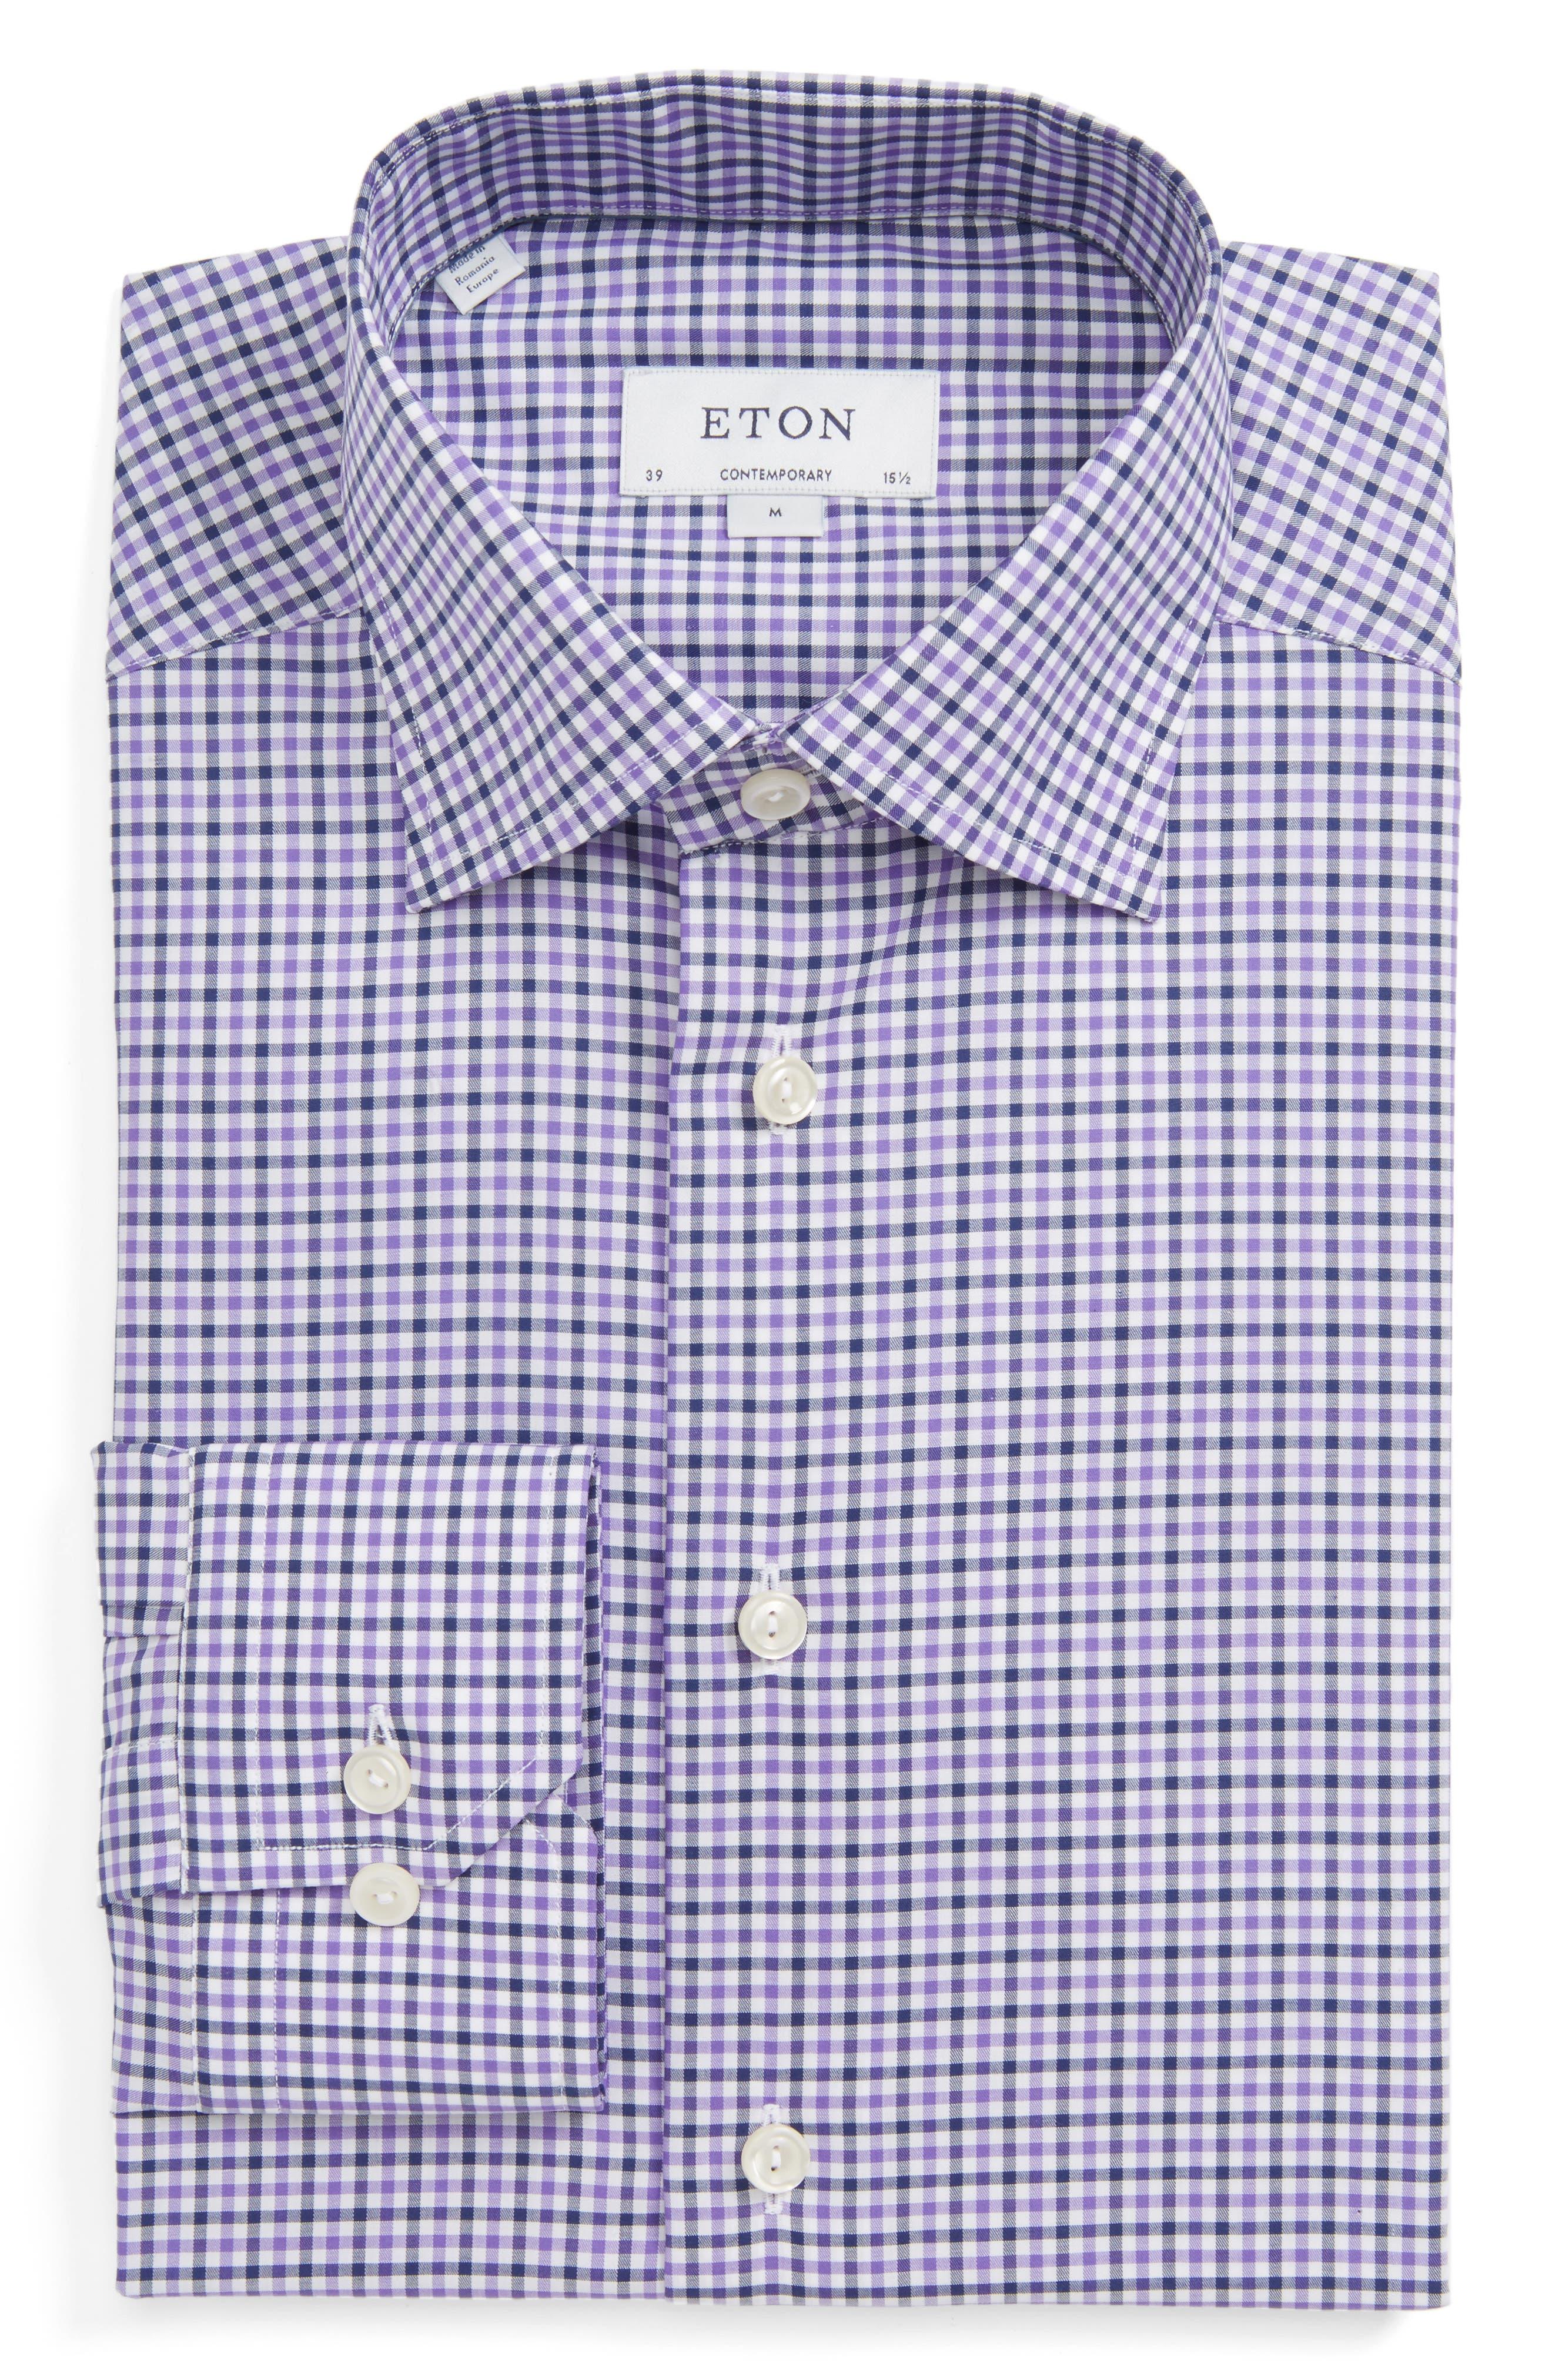 Contemporary Fit Check Dress Shirt,                             Main thumbnail 1, color,                             Purple